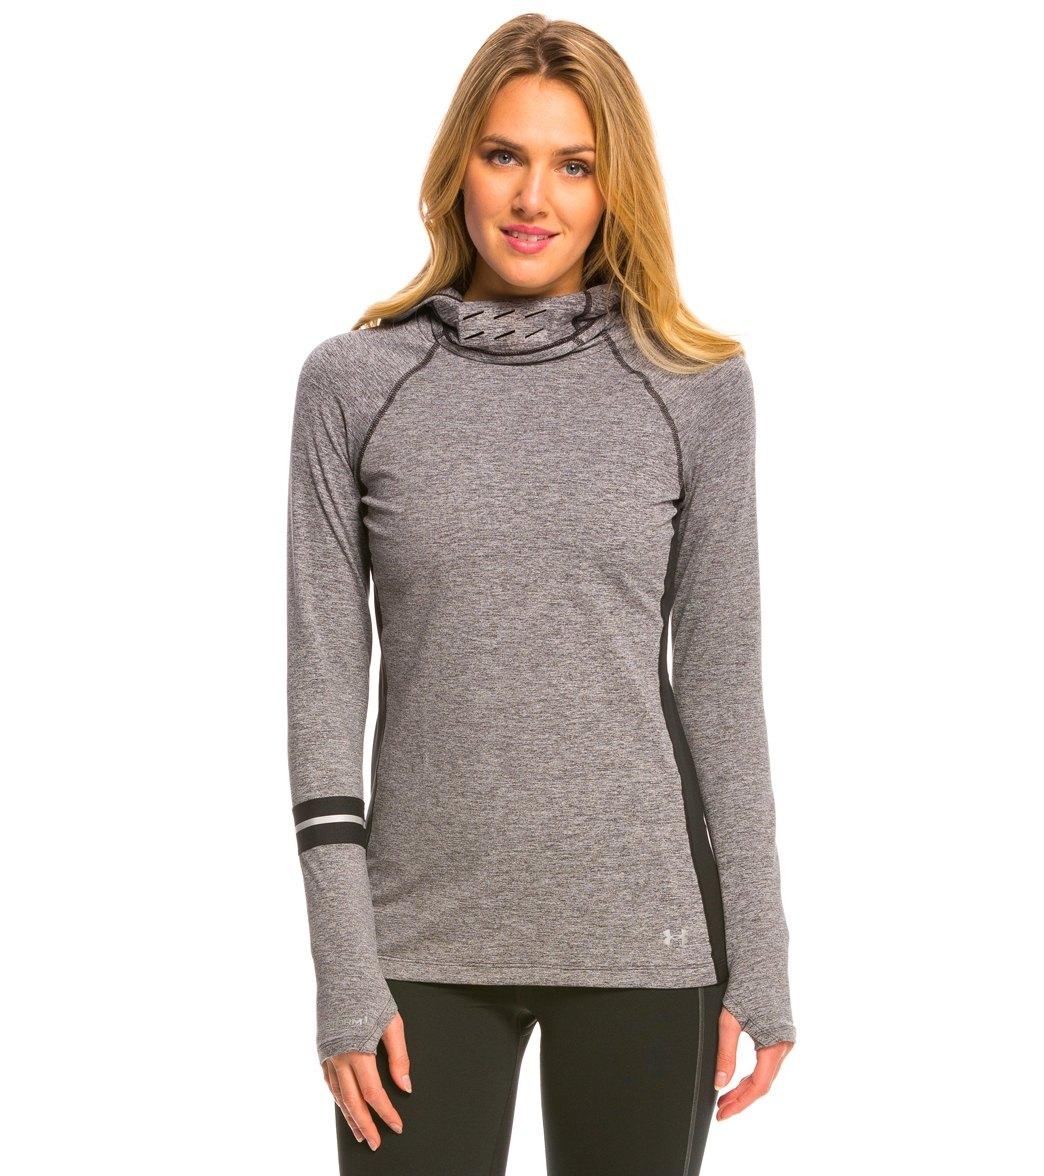 827b76774b64 Under Armour Womens Sweatshirts Hoodies - BCD Tofu House